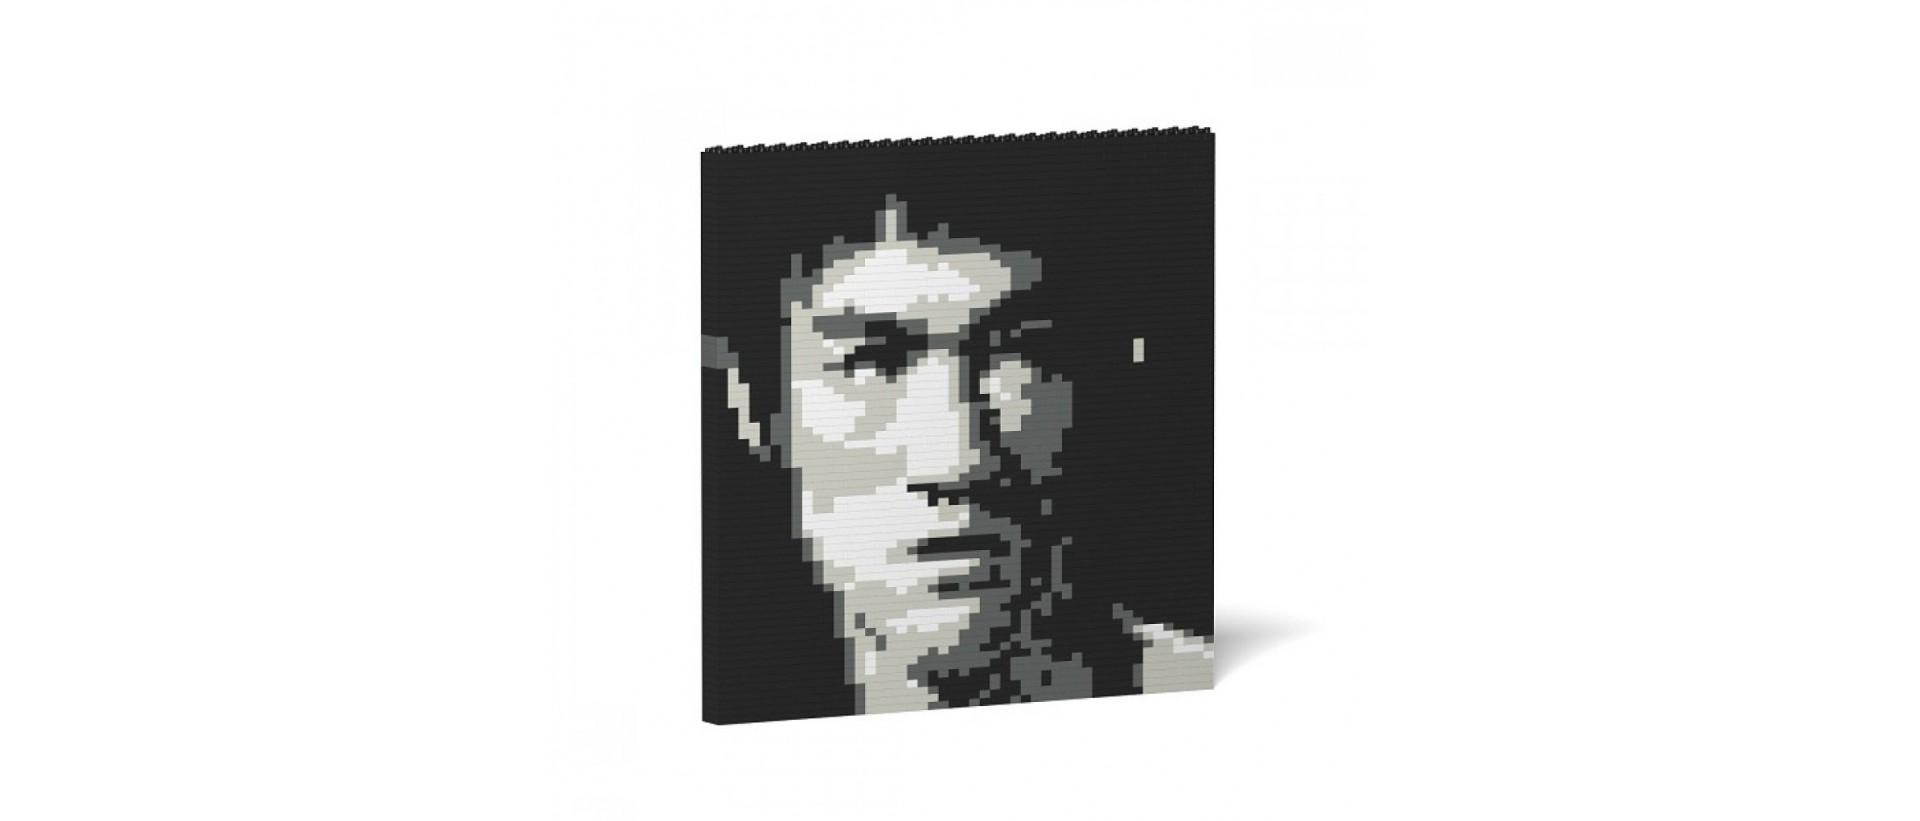 Bruce Lee S03